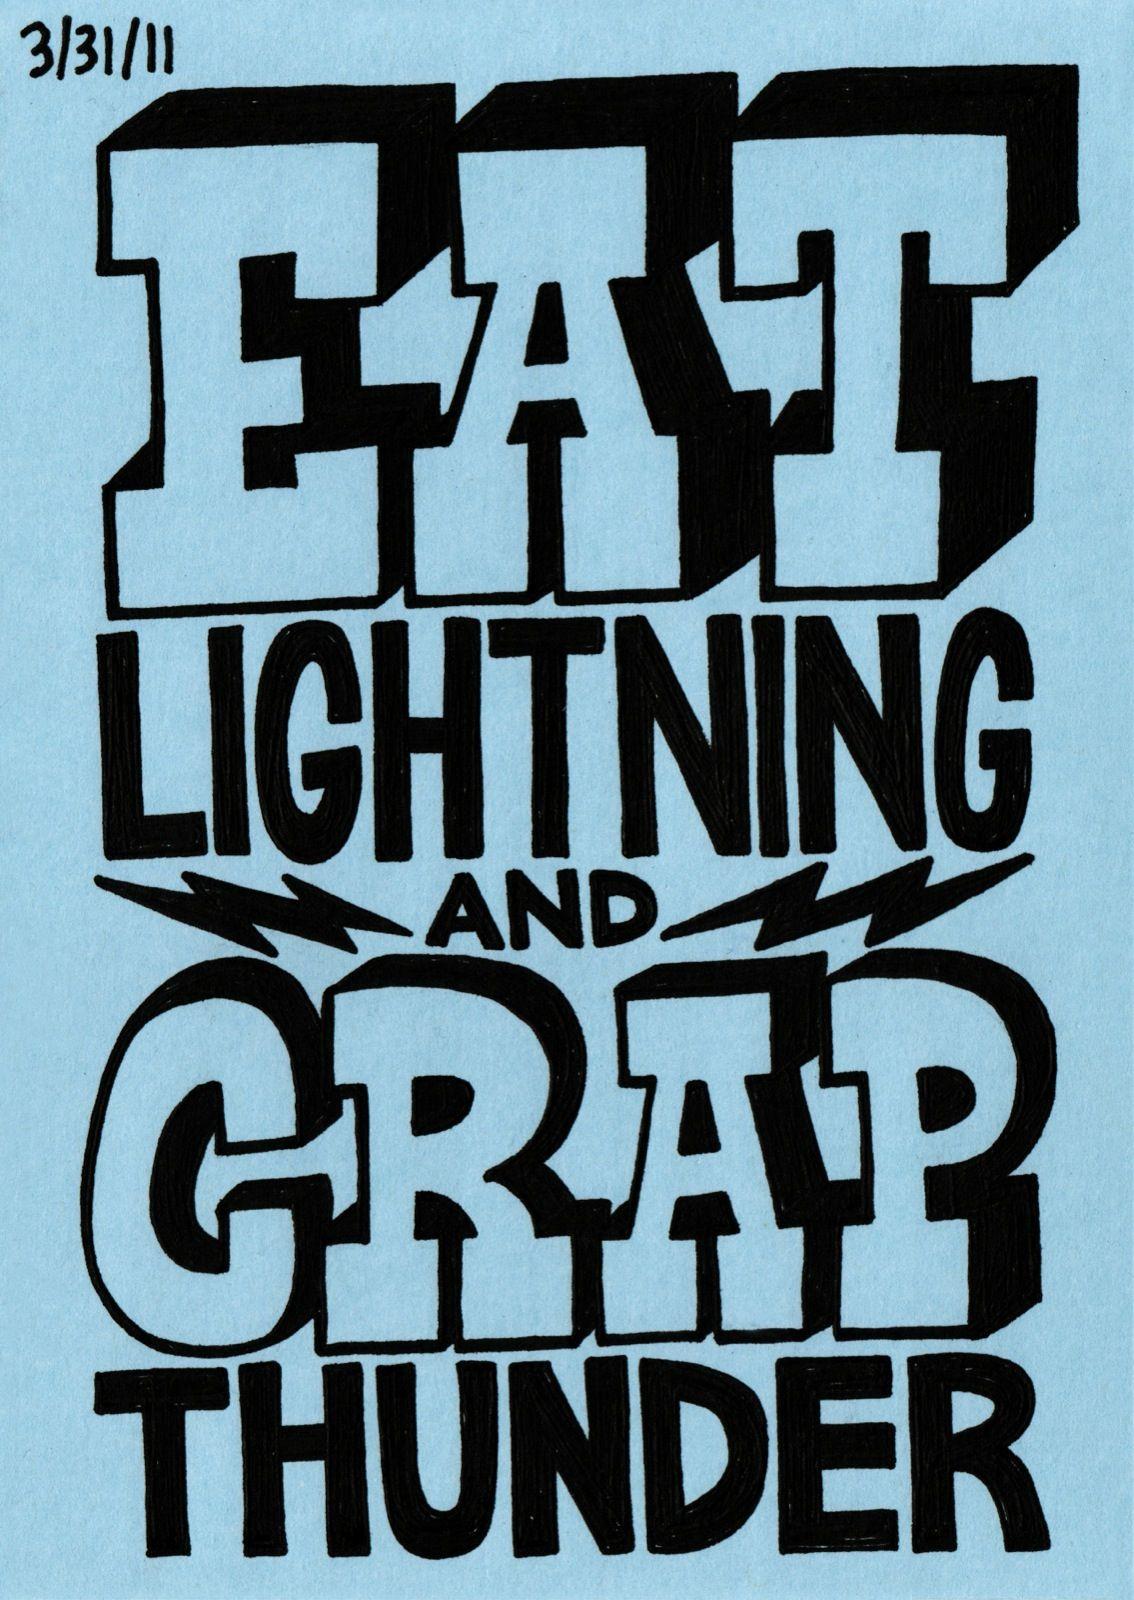 Rocky eat lightning and crap thunder horseshoe poker tournaments tunica